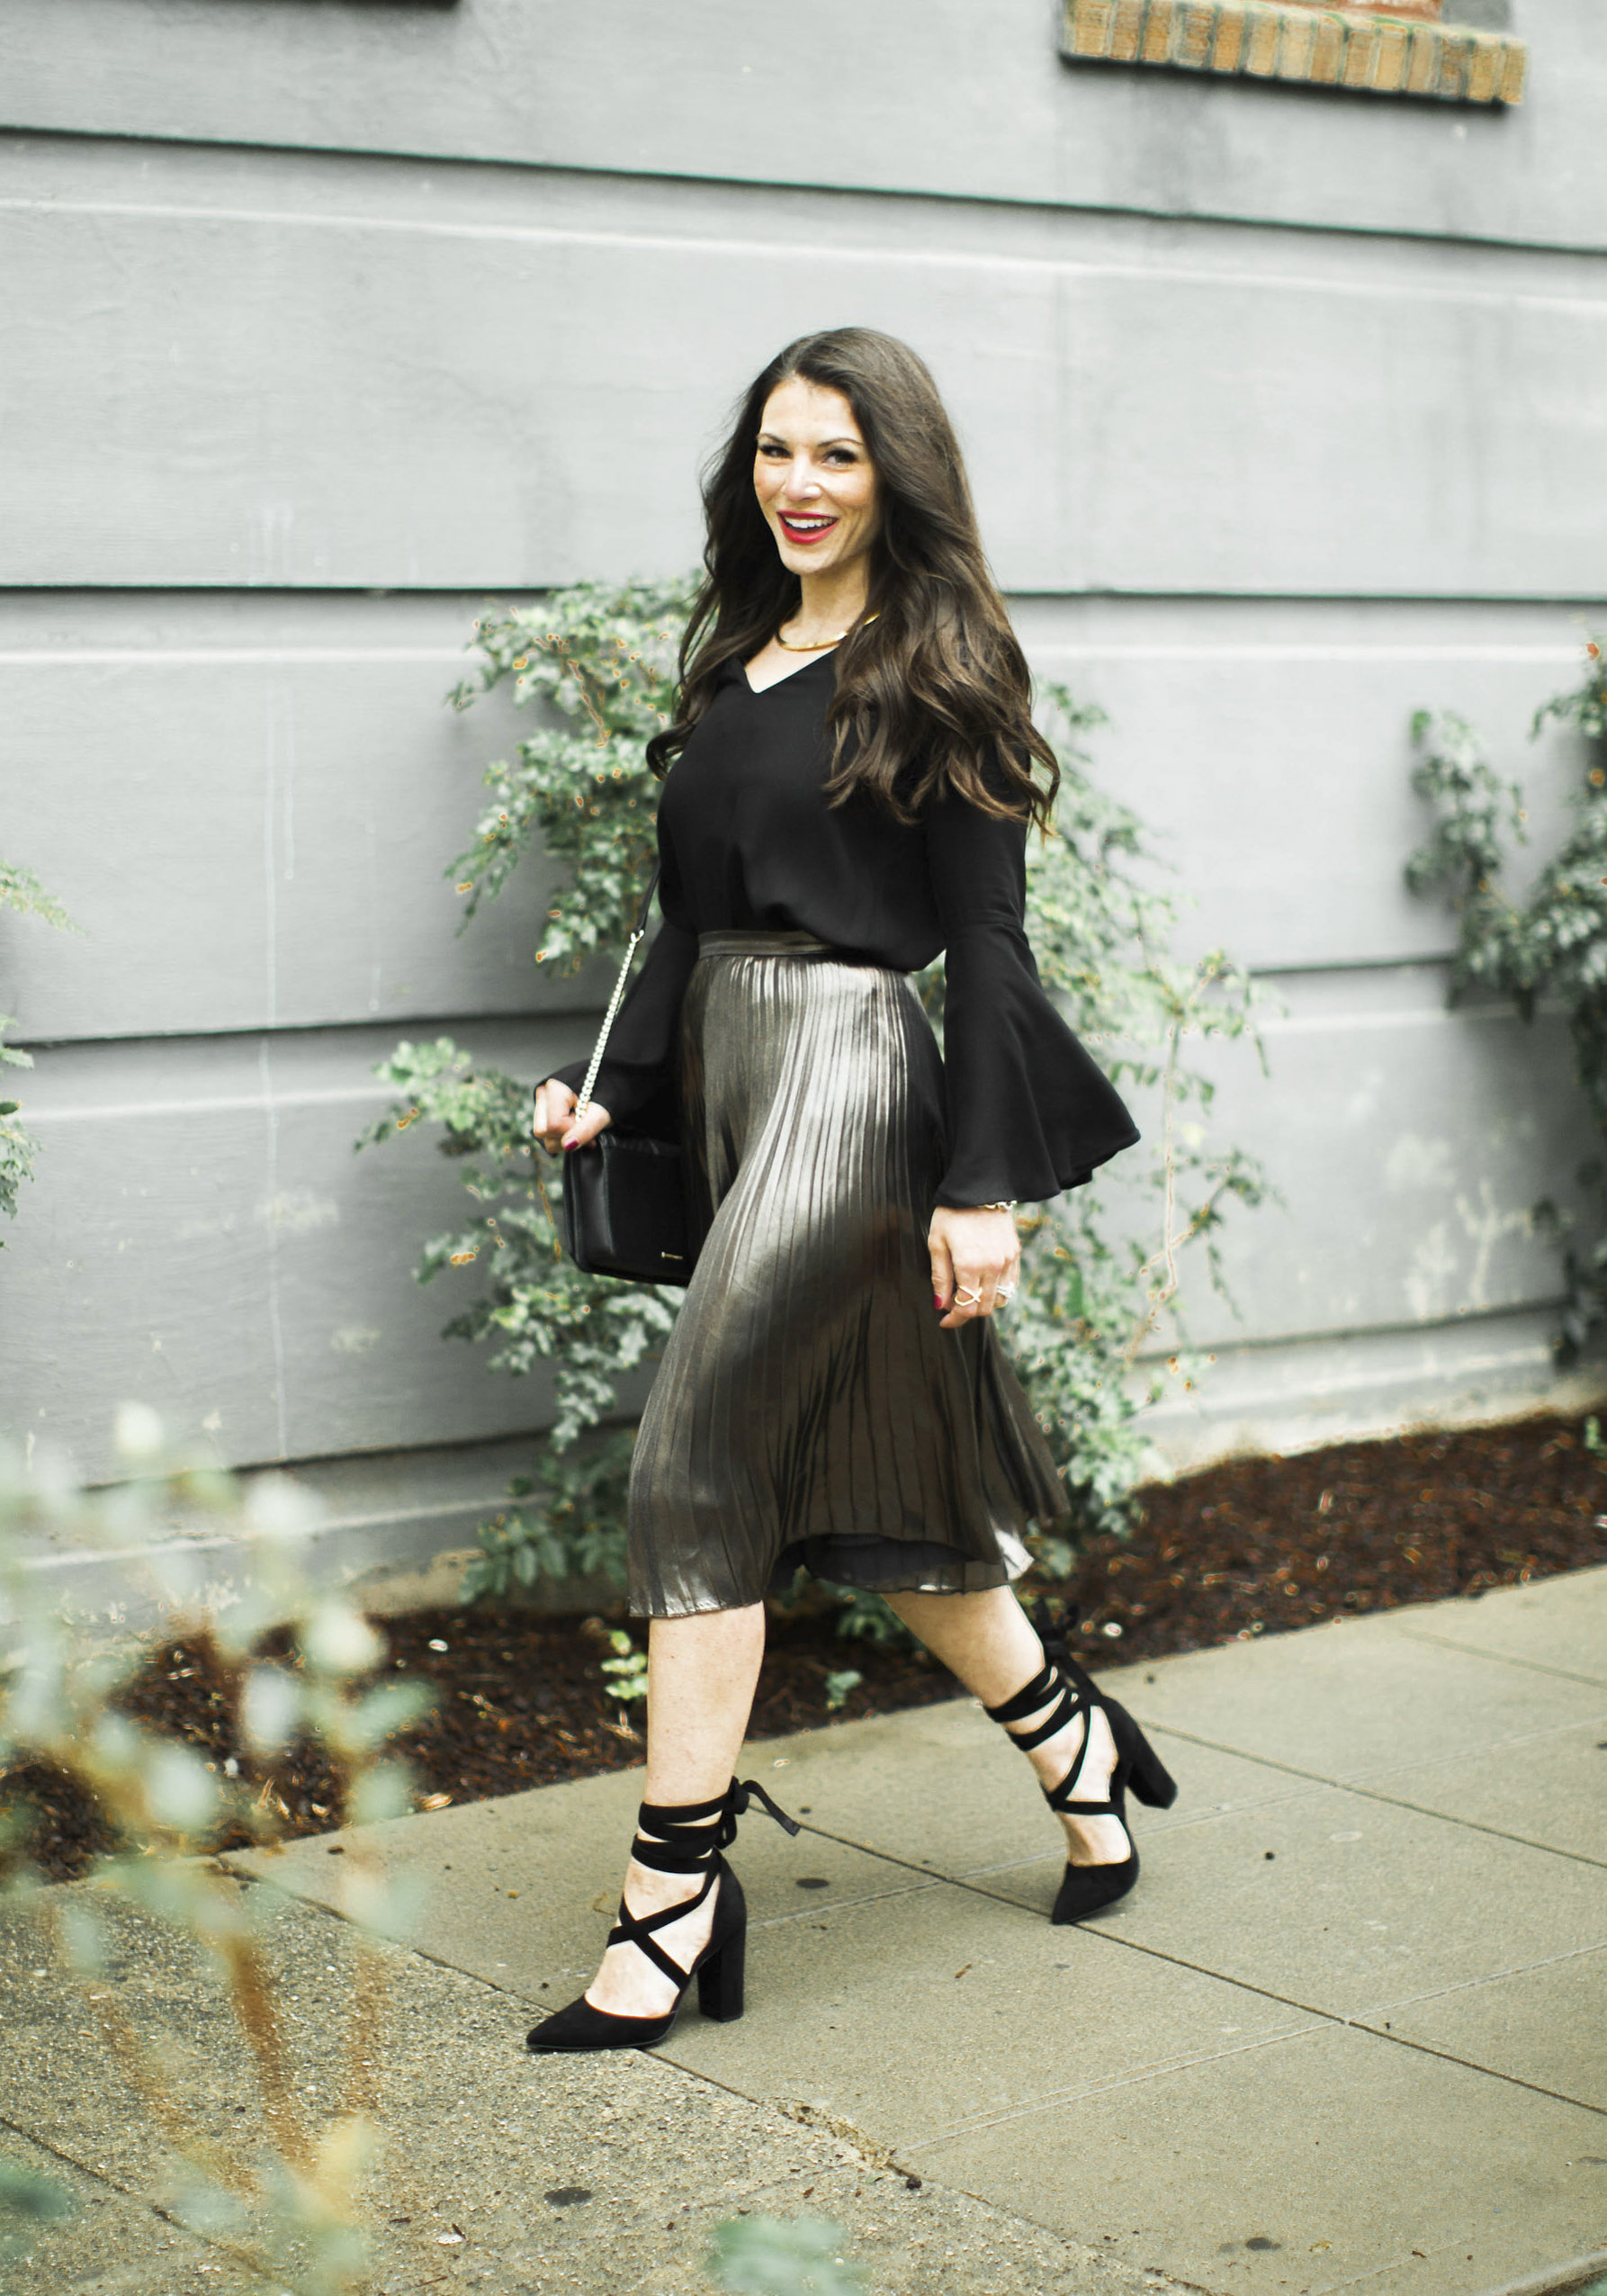 NYE outfit, metallic pleated midi skirt, bell sleeve blouse, Steve Madden Bryony Pumps, & Rebecca Minkoff Love crossbody bag.